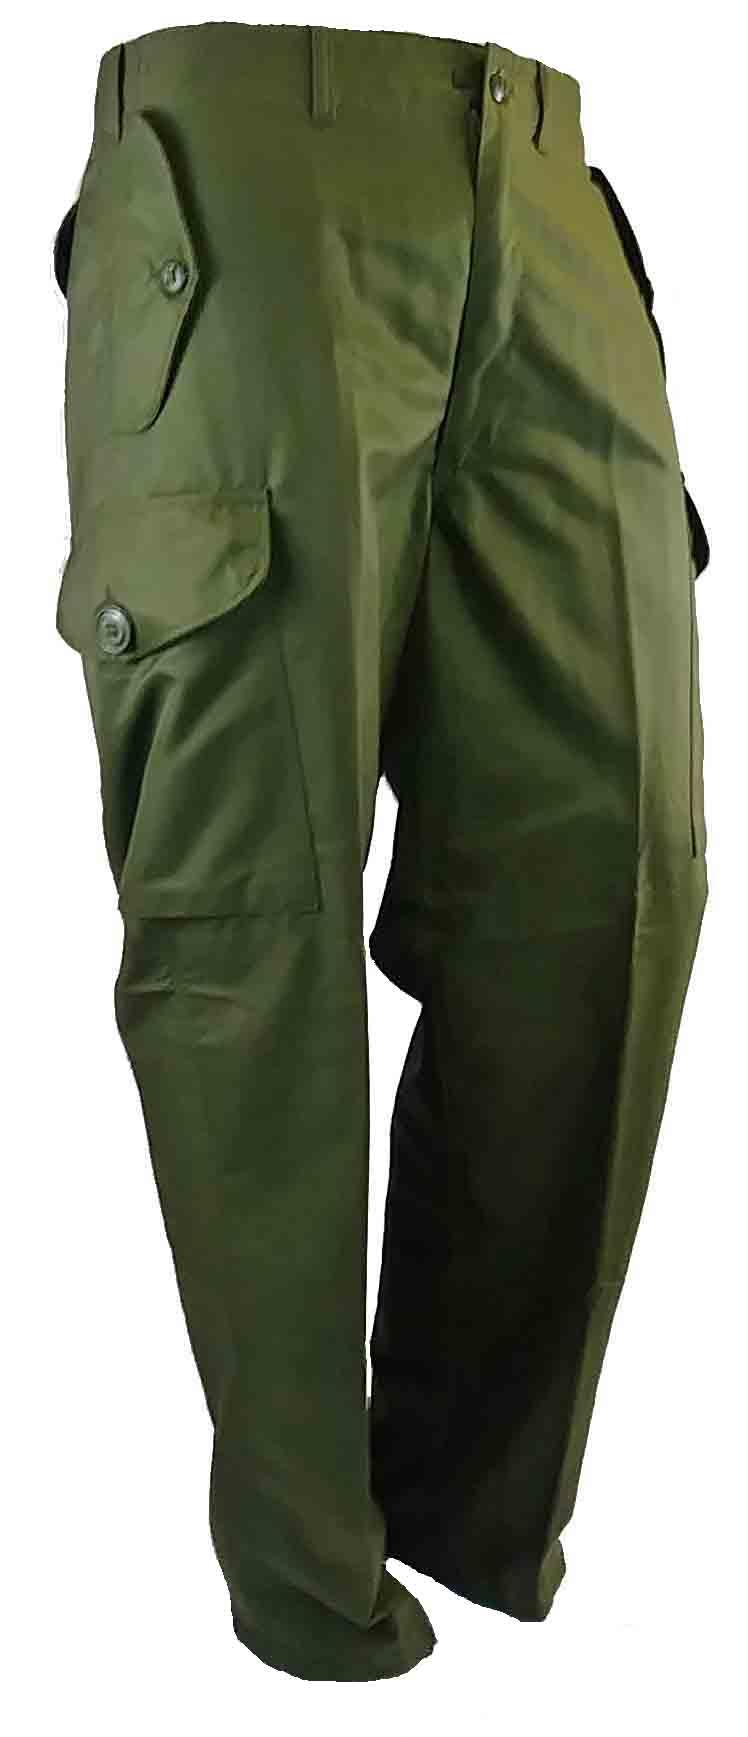 Wind proof combat style pant.